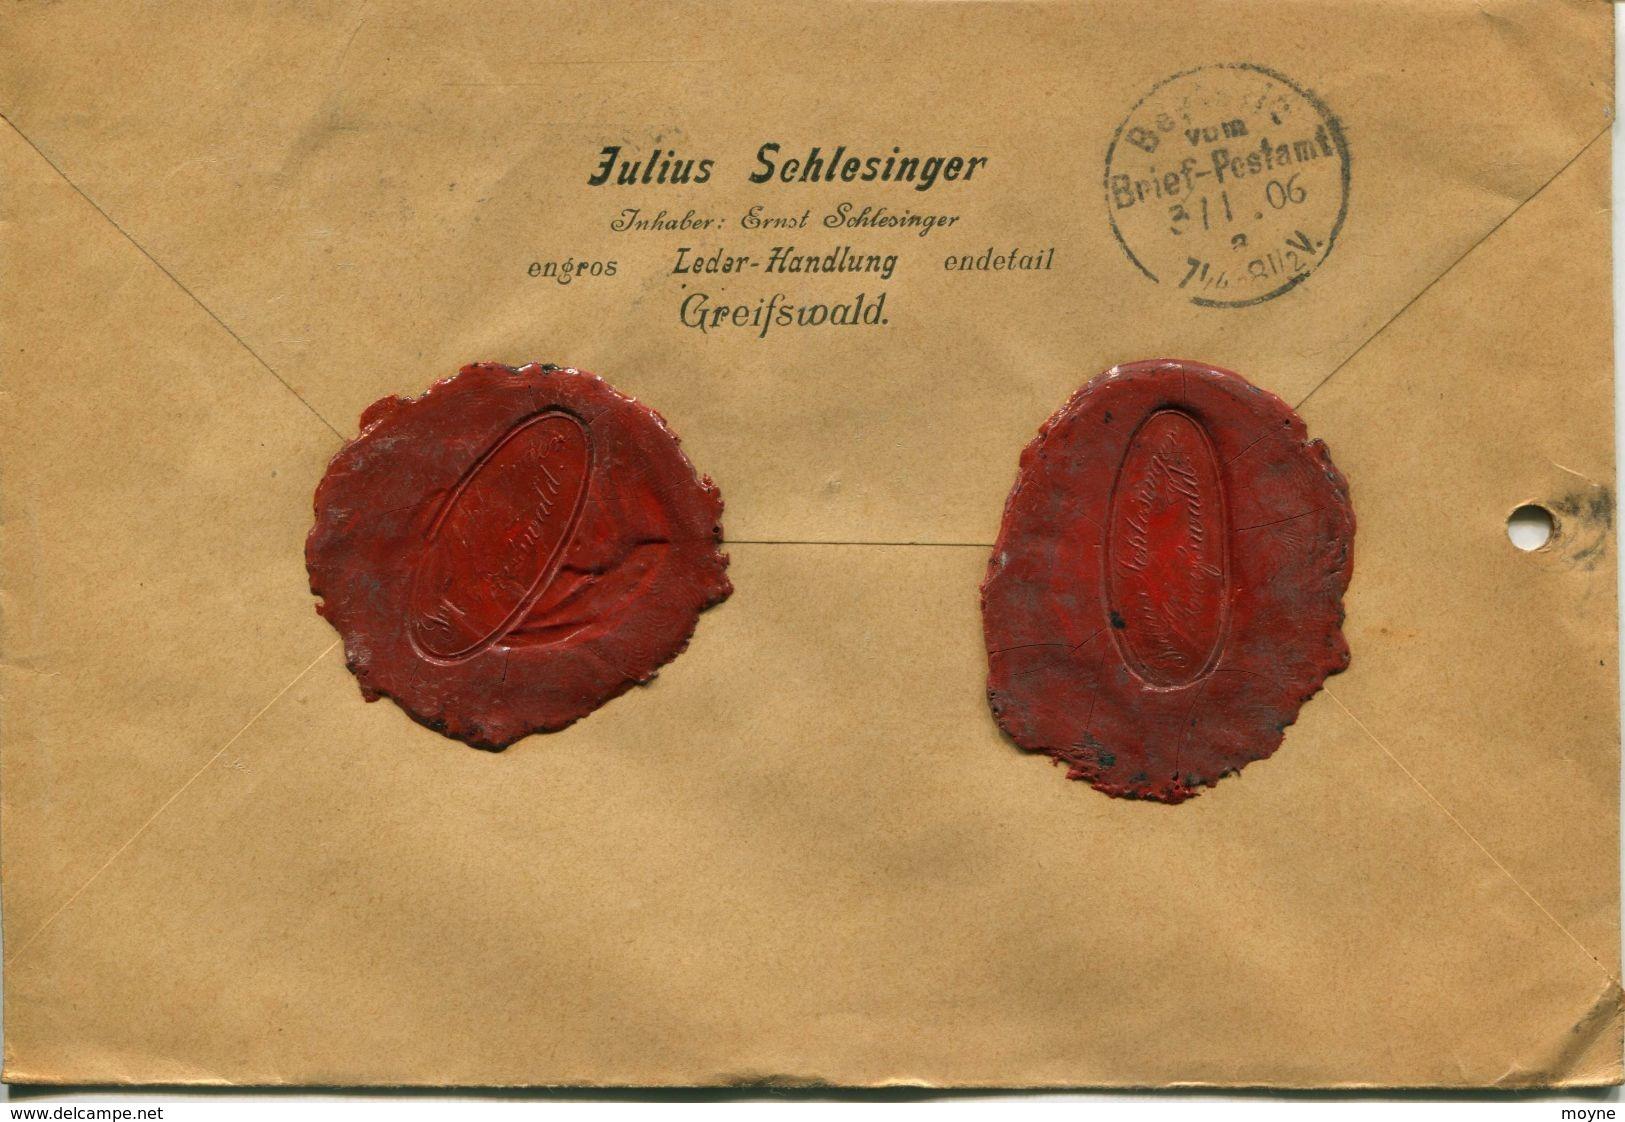 ENV 7 - Allemagne - Brief Geladen - LETTRE CHARGEE De  GREIFSWALD à  BERLIN   1/02/.1906  - 2 Timbres 20  D.Reich Bleu - Germany